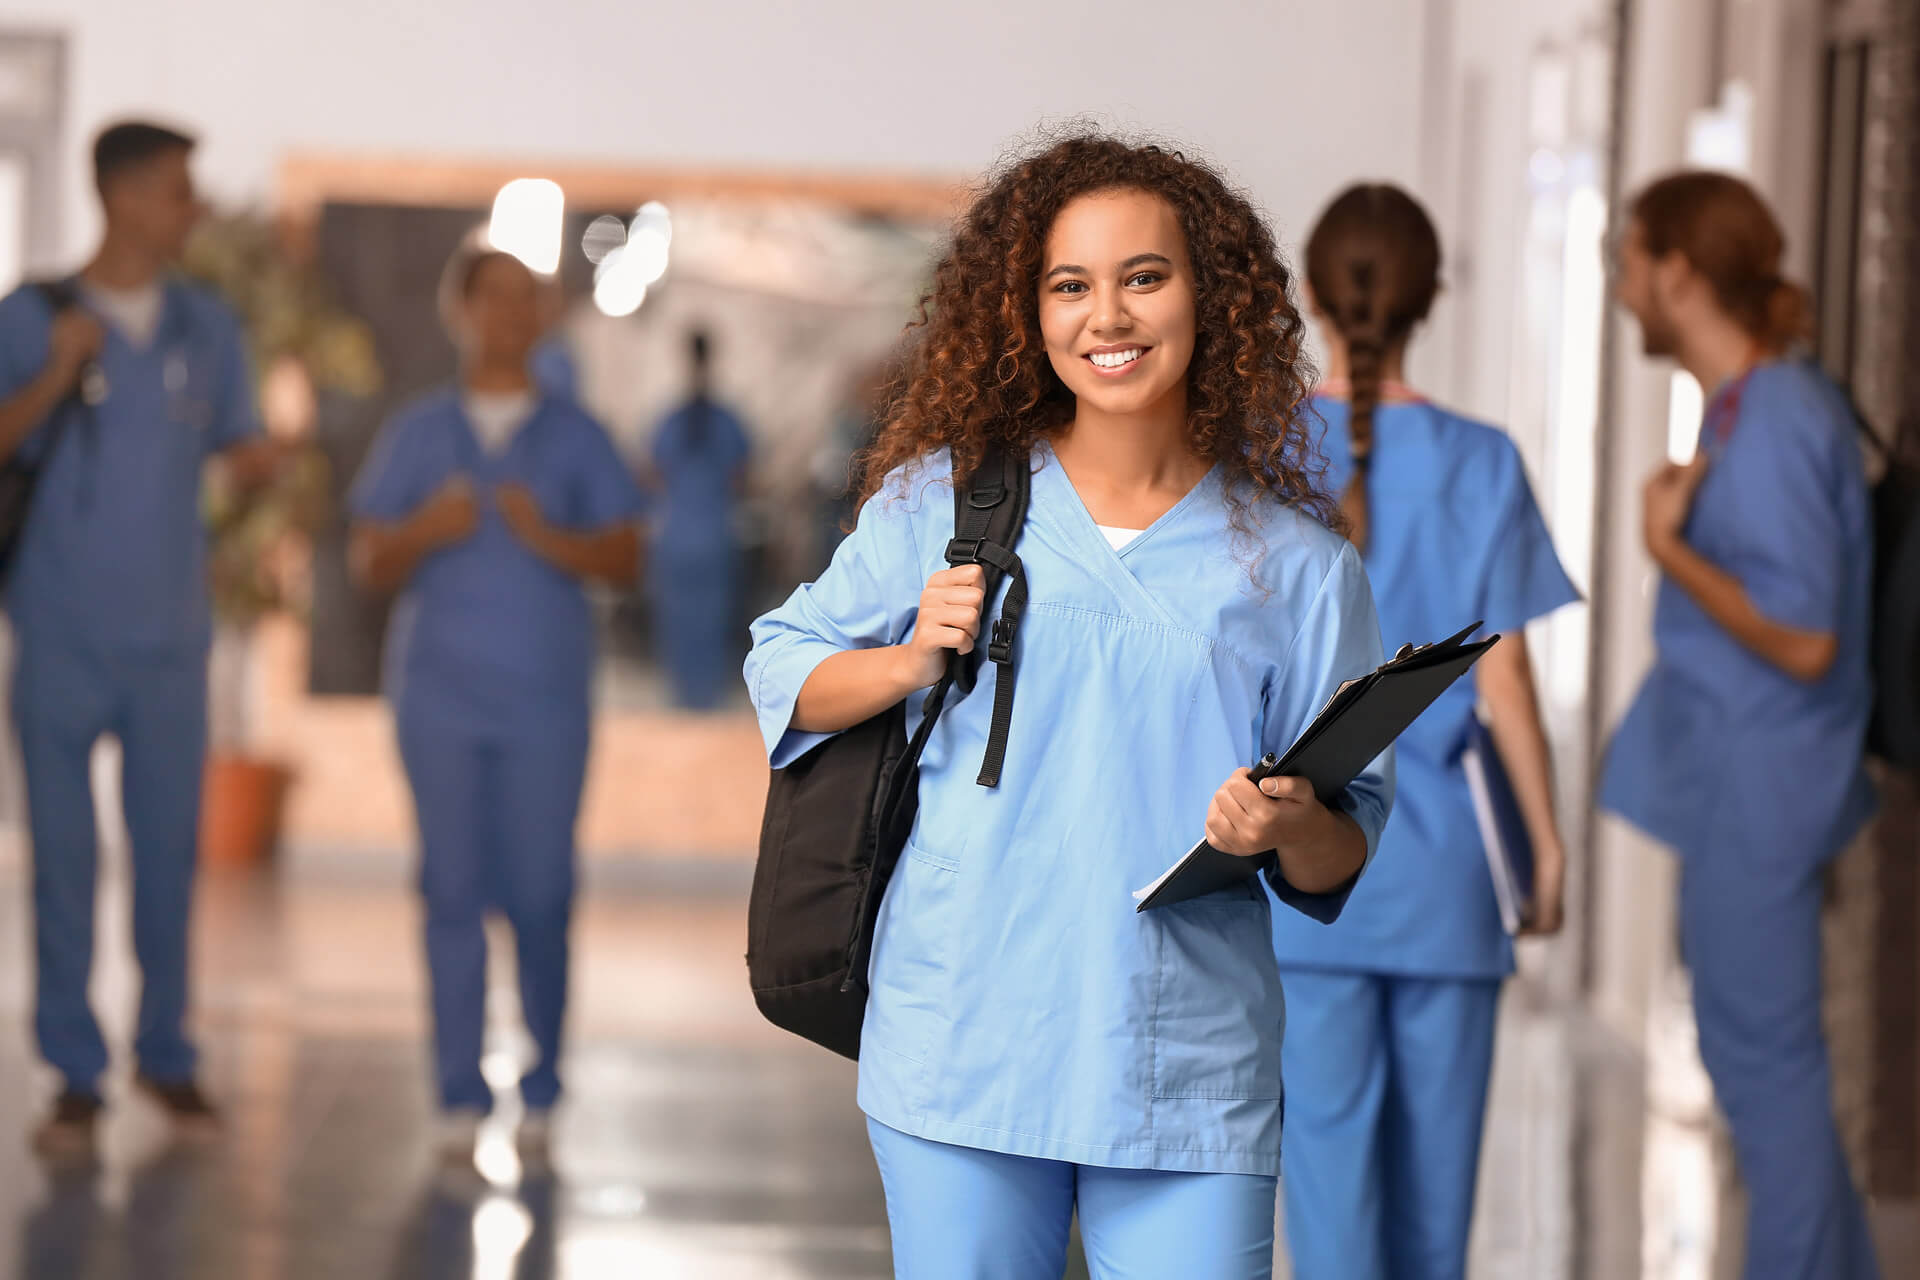 Kelvyn Park Allied Health Student